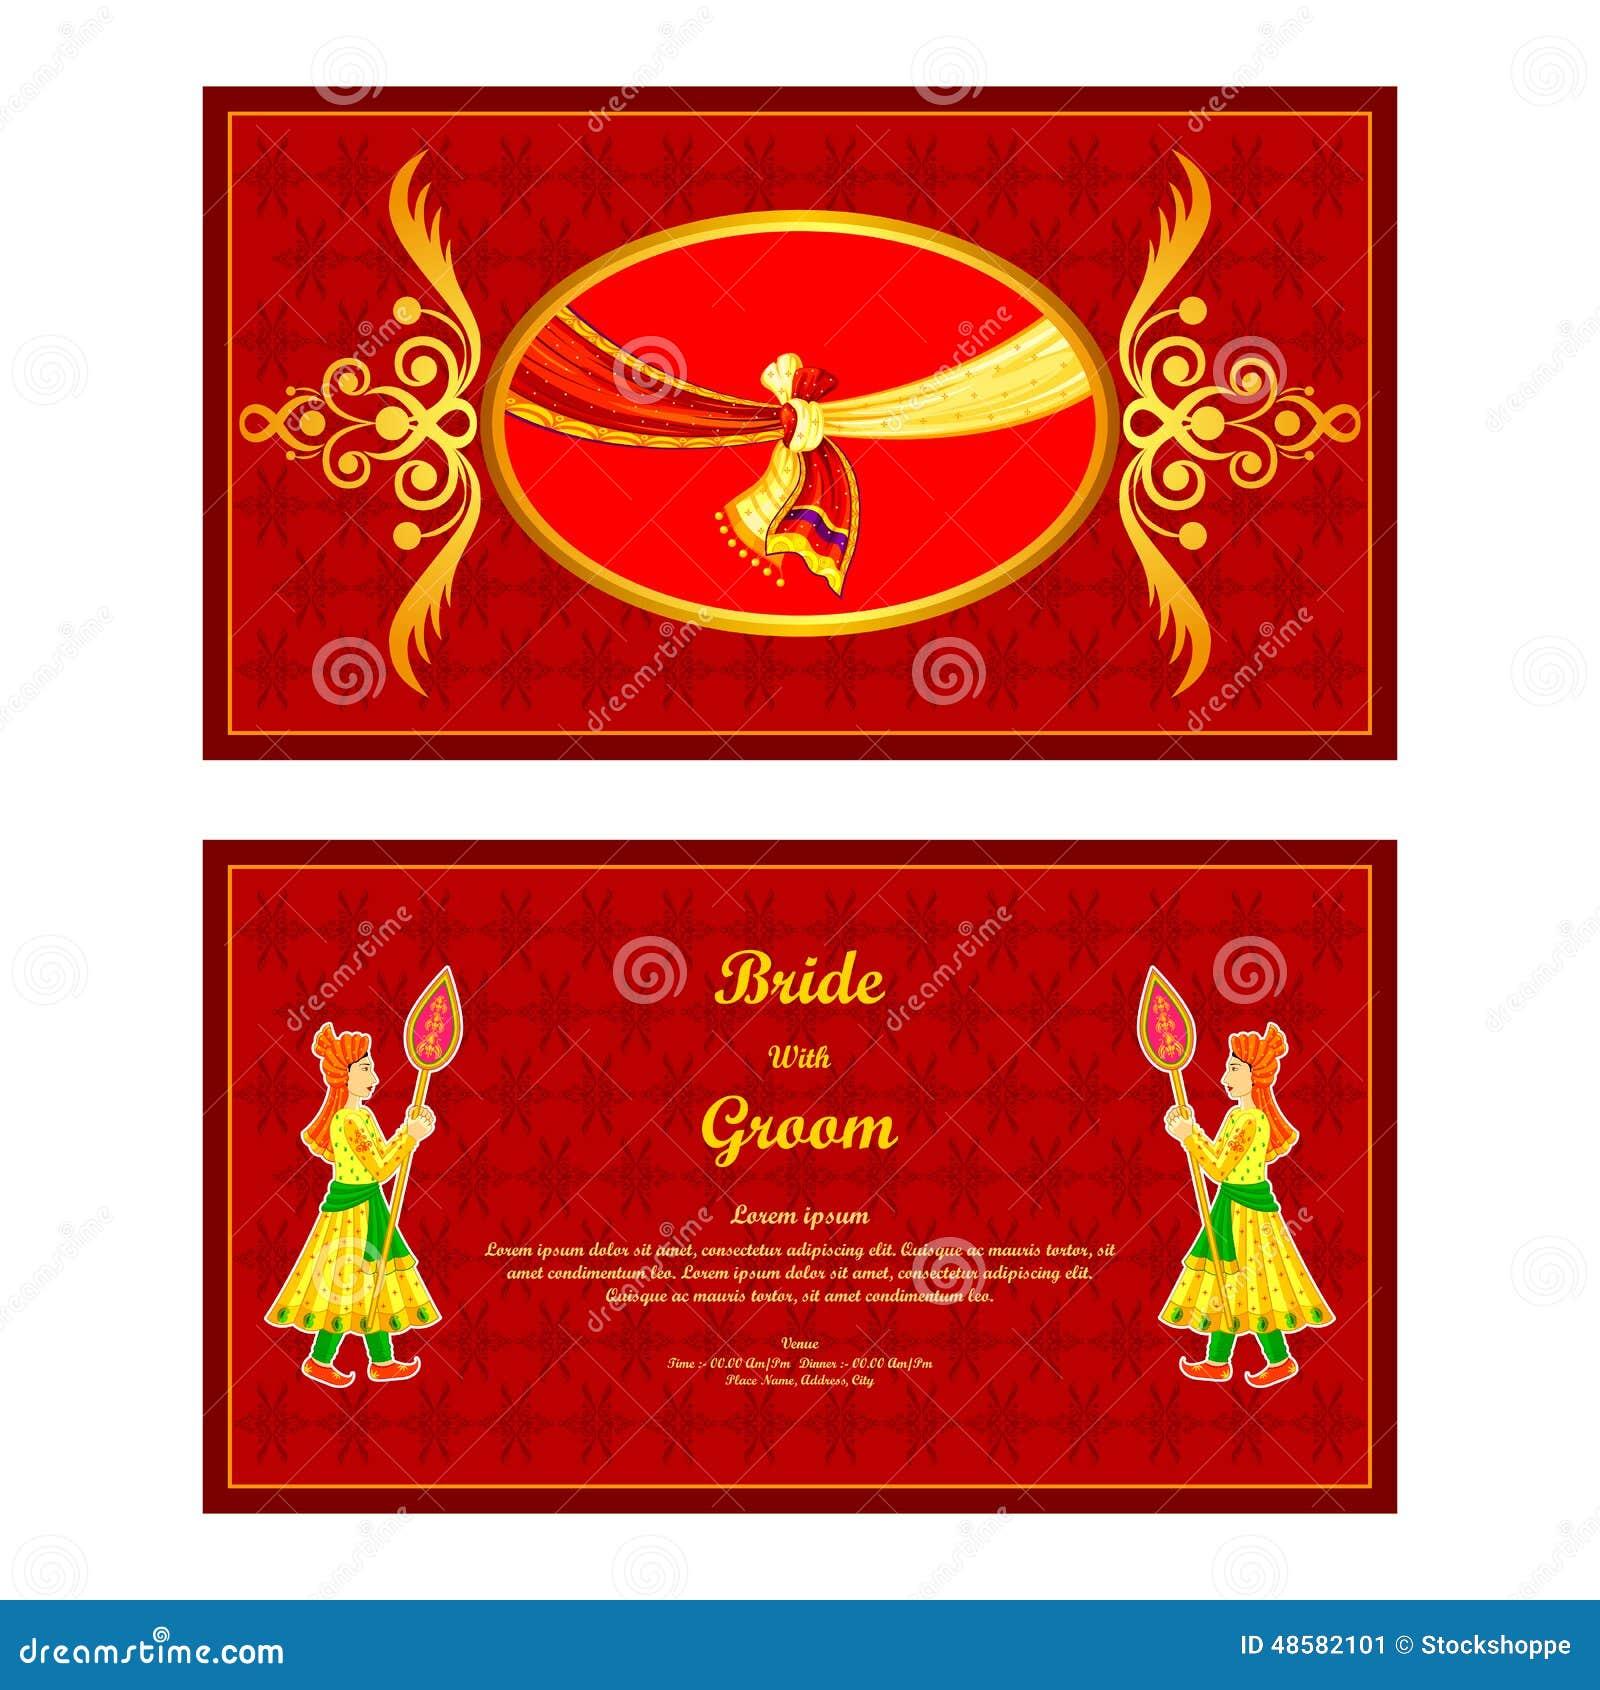 Indian Wedding Invitation Card Stock Vector - Illustration of ...